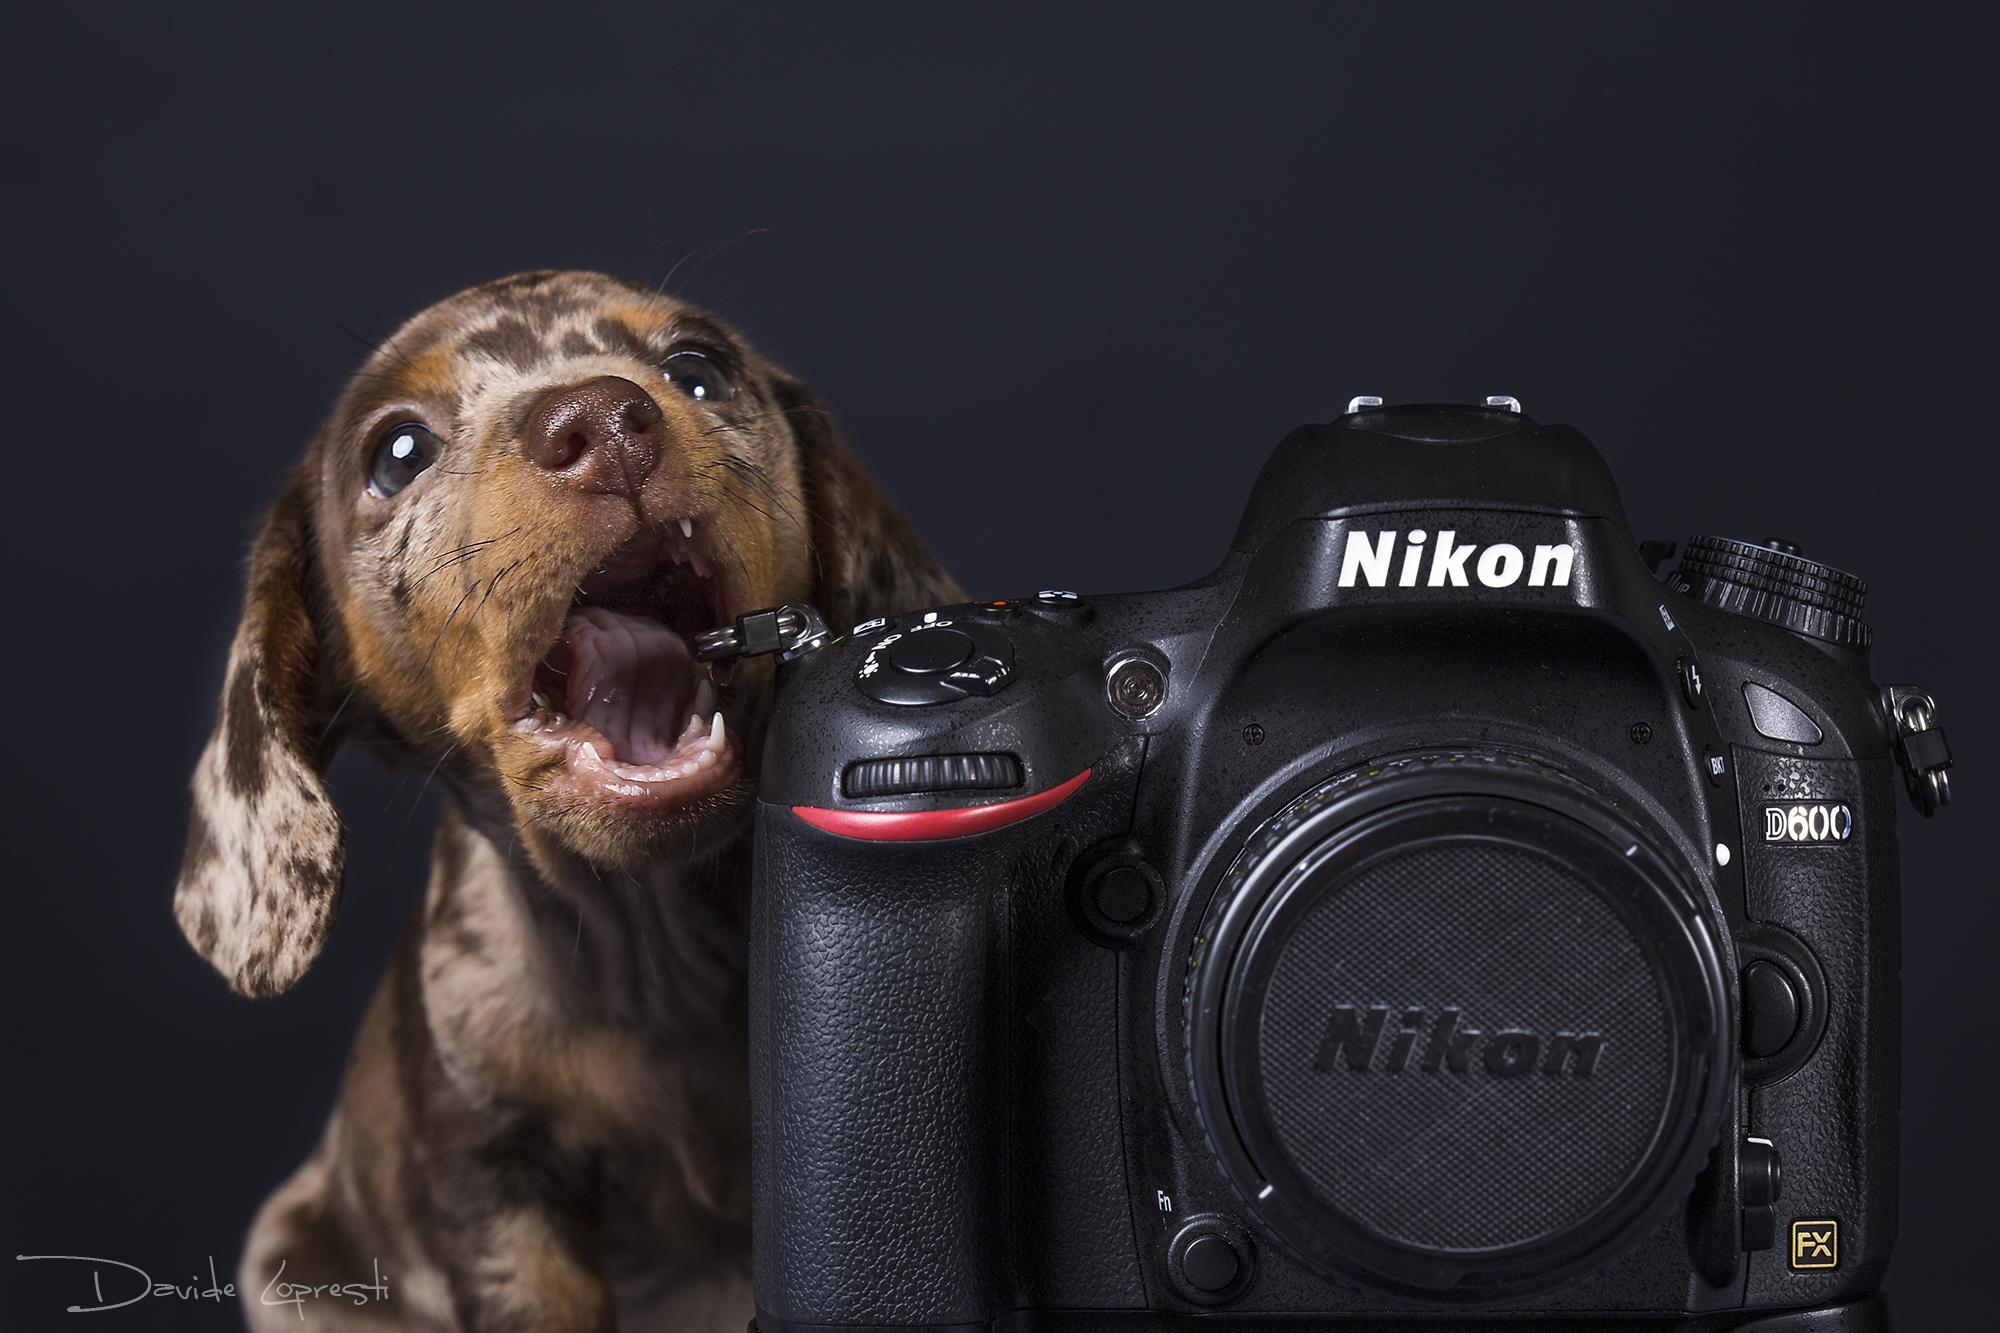 эти фото смешного фотоаппарата они